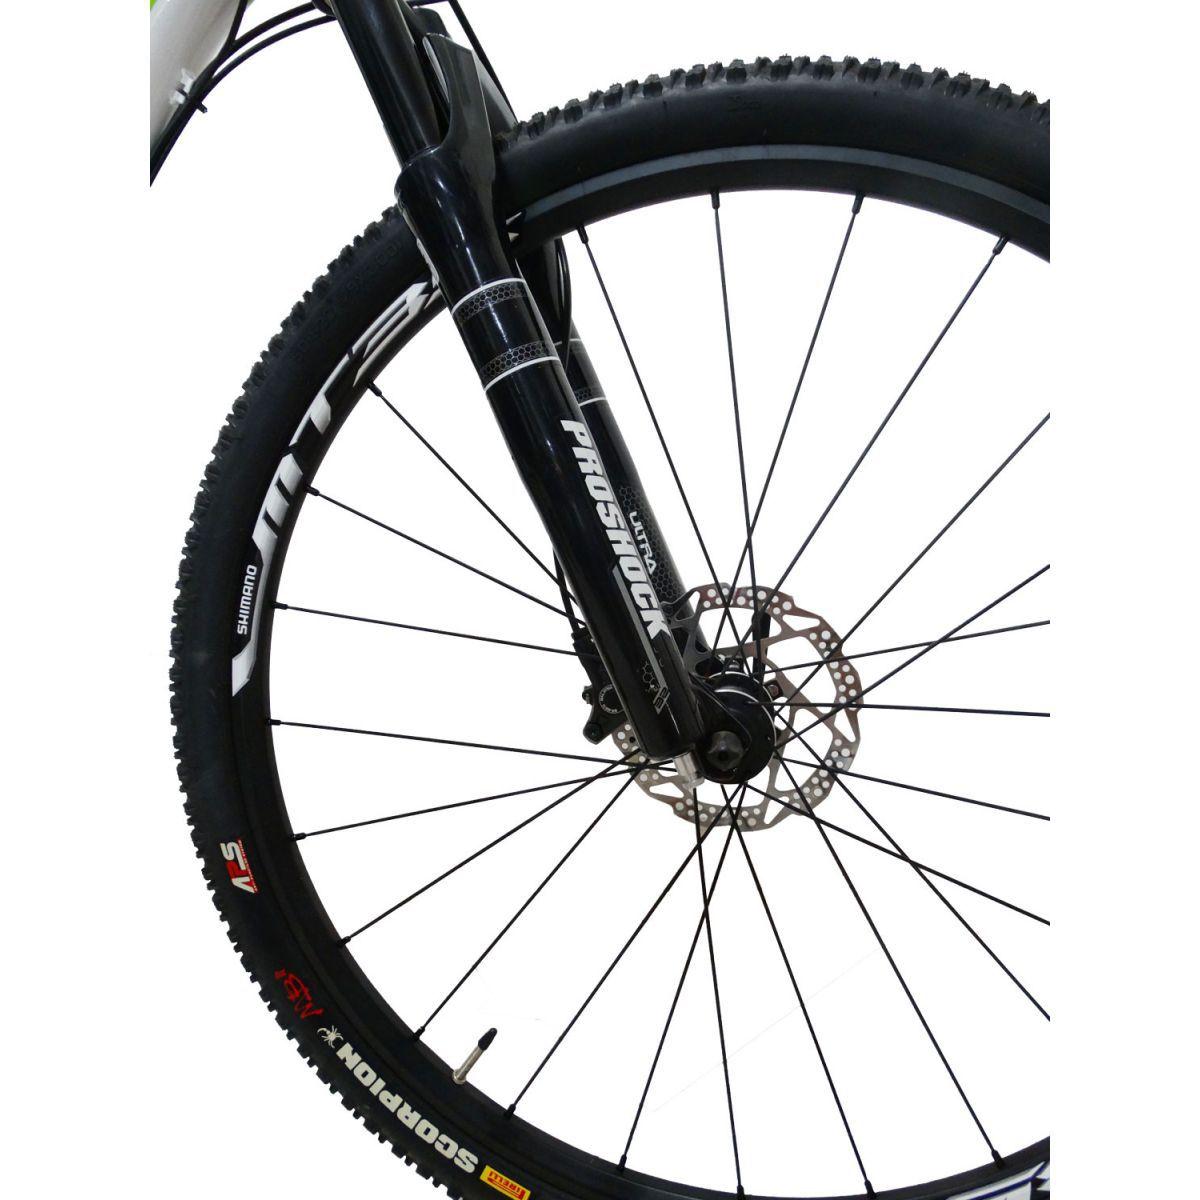 Bicicleta ASTRO XTC XC Full aro 29 - Shimano Deore/XT 30v - Freio Hidráulico